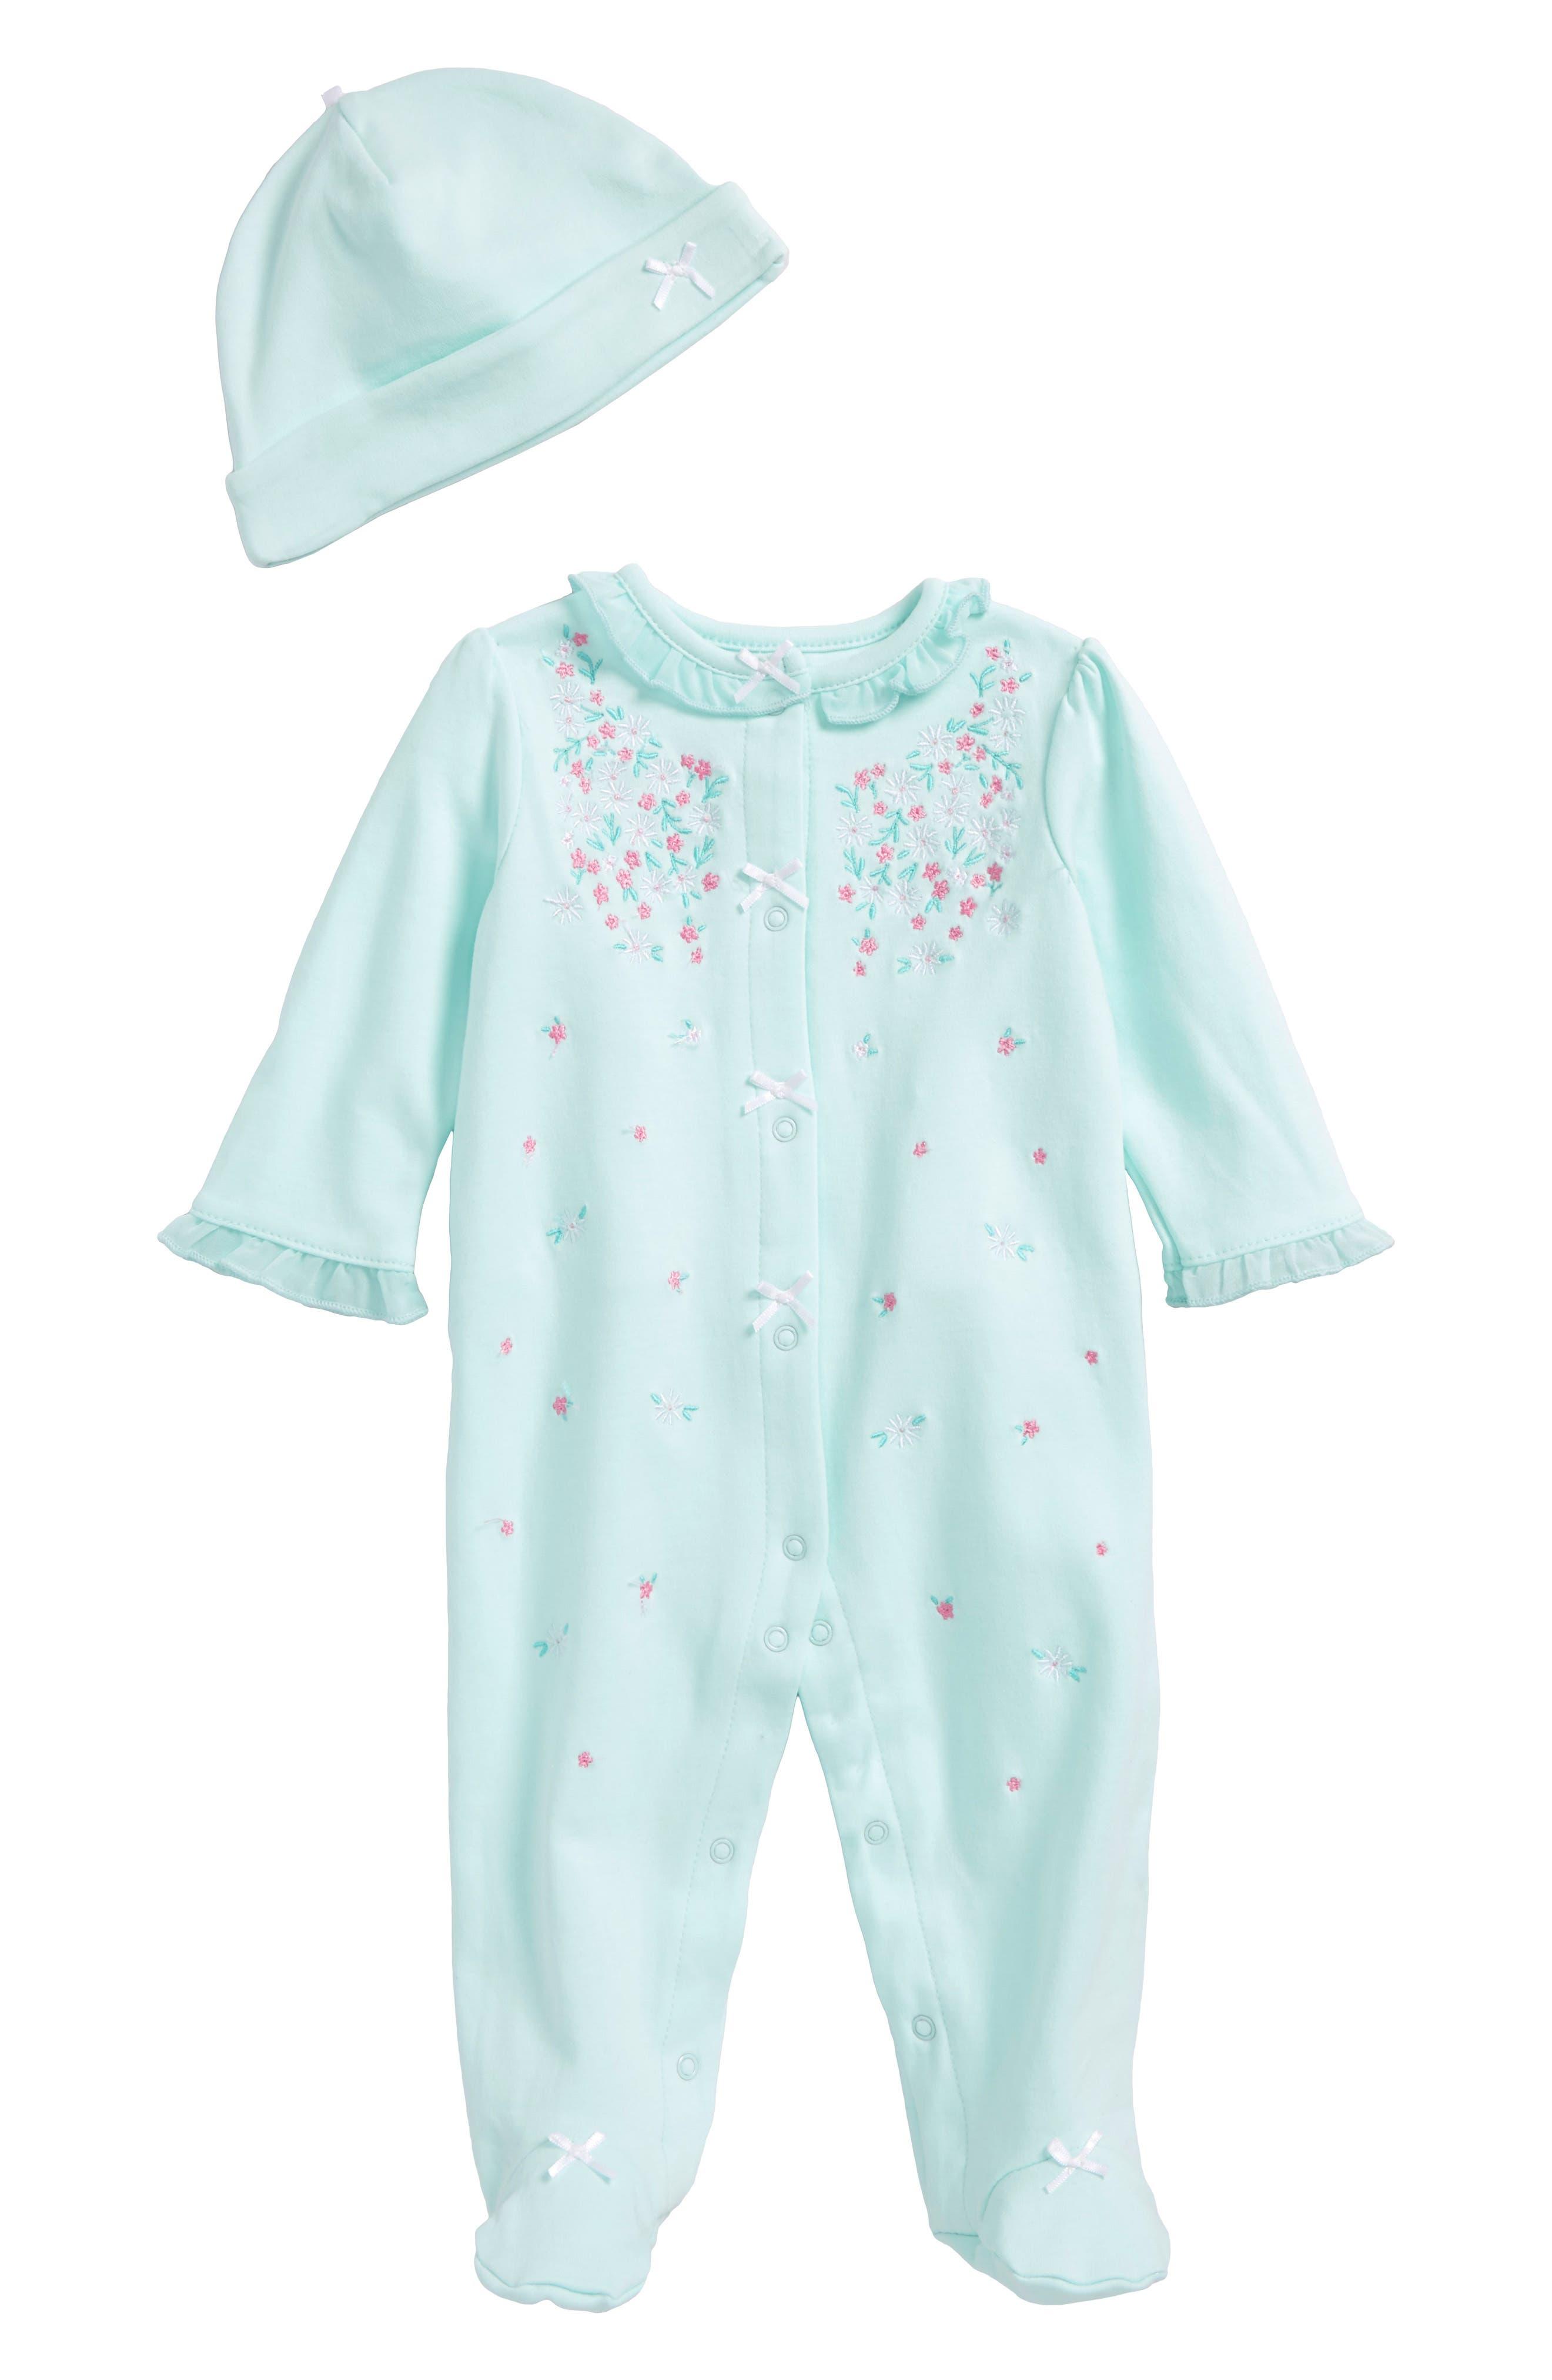 Baby Girls Beige Clothing Dresses Bodysuits & Footies